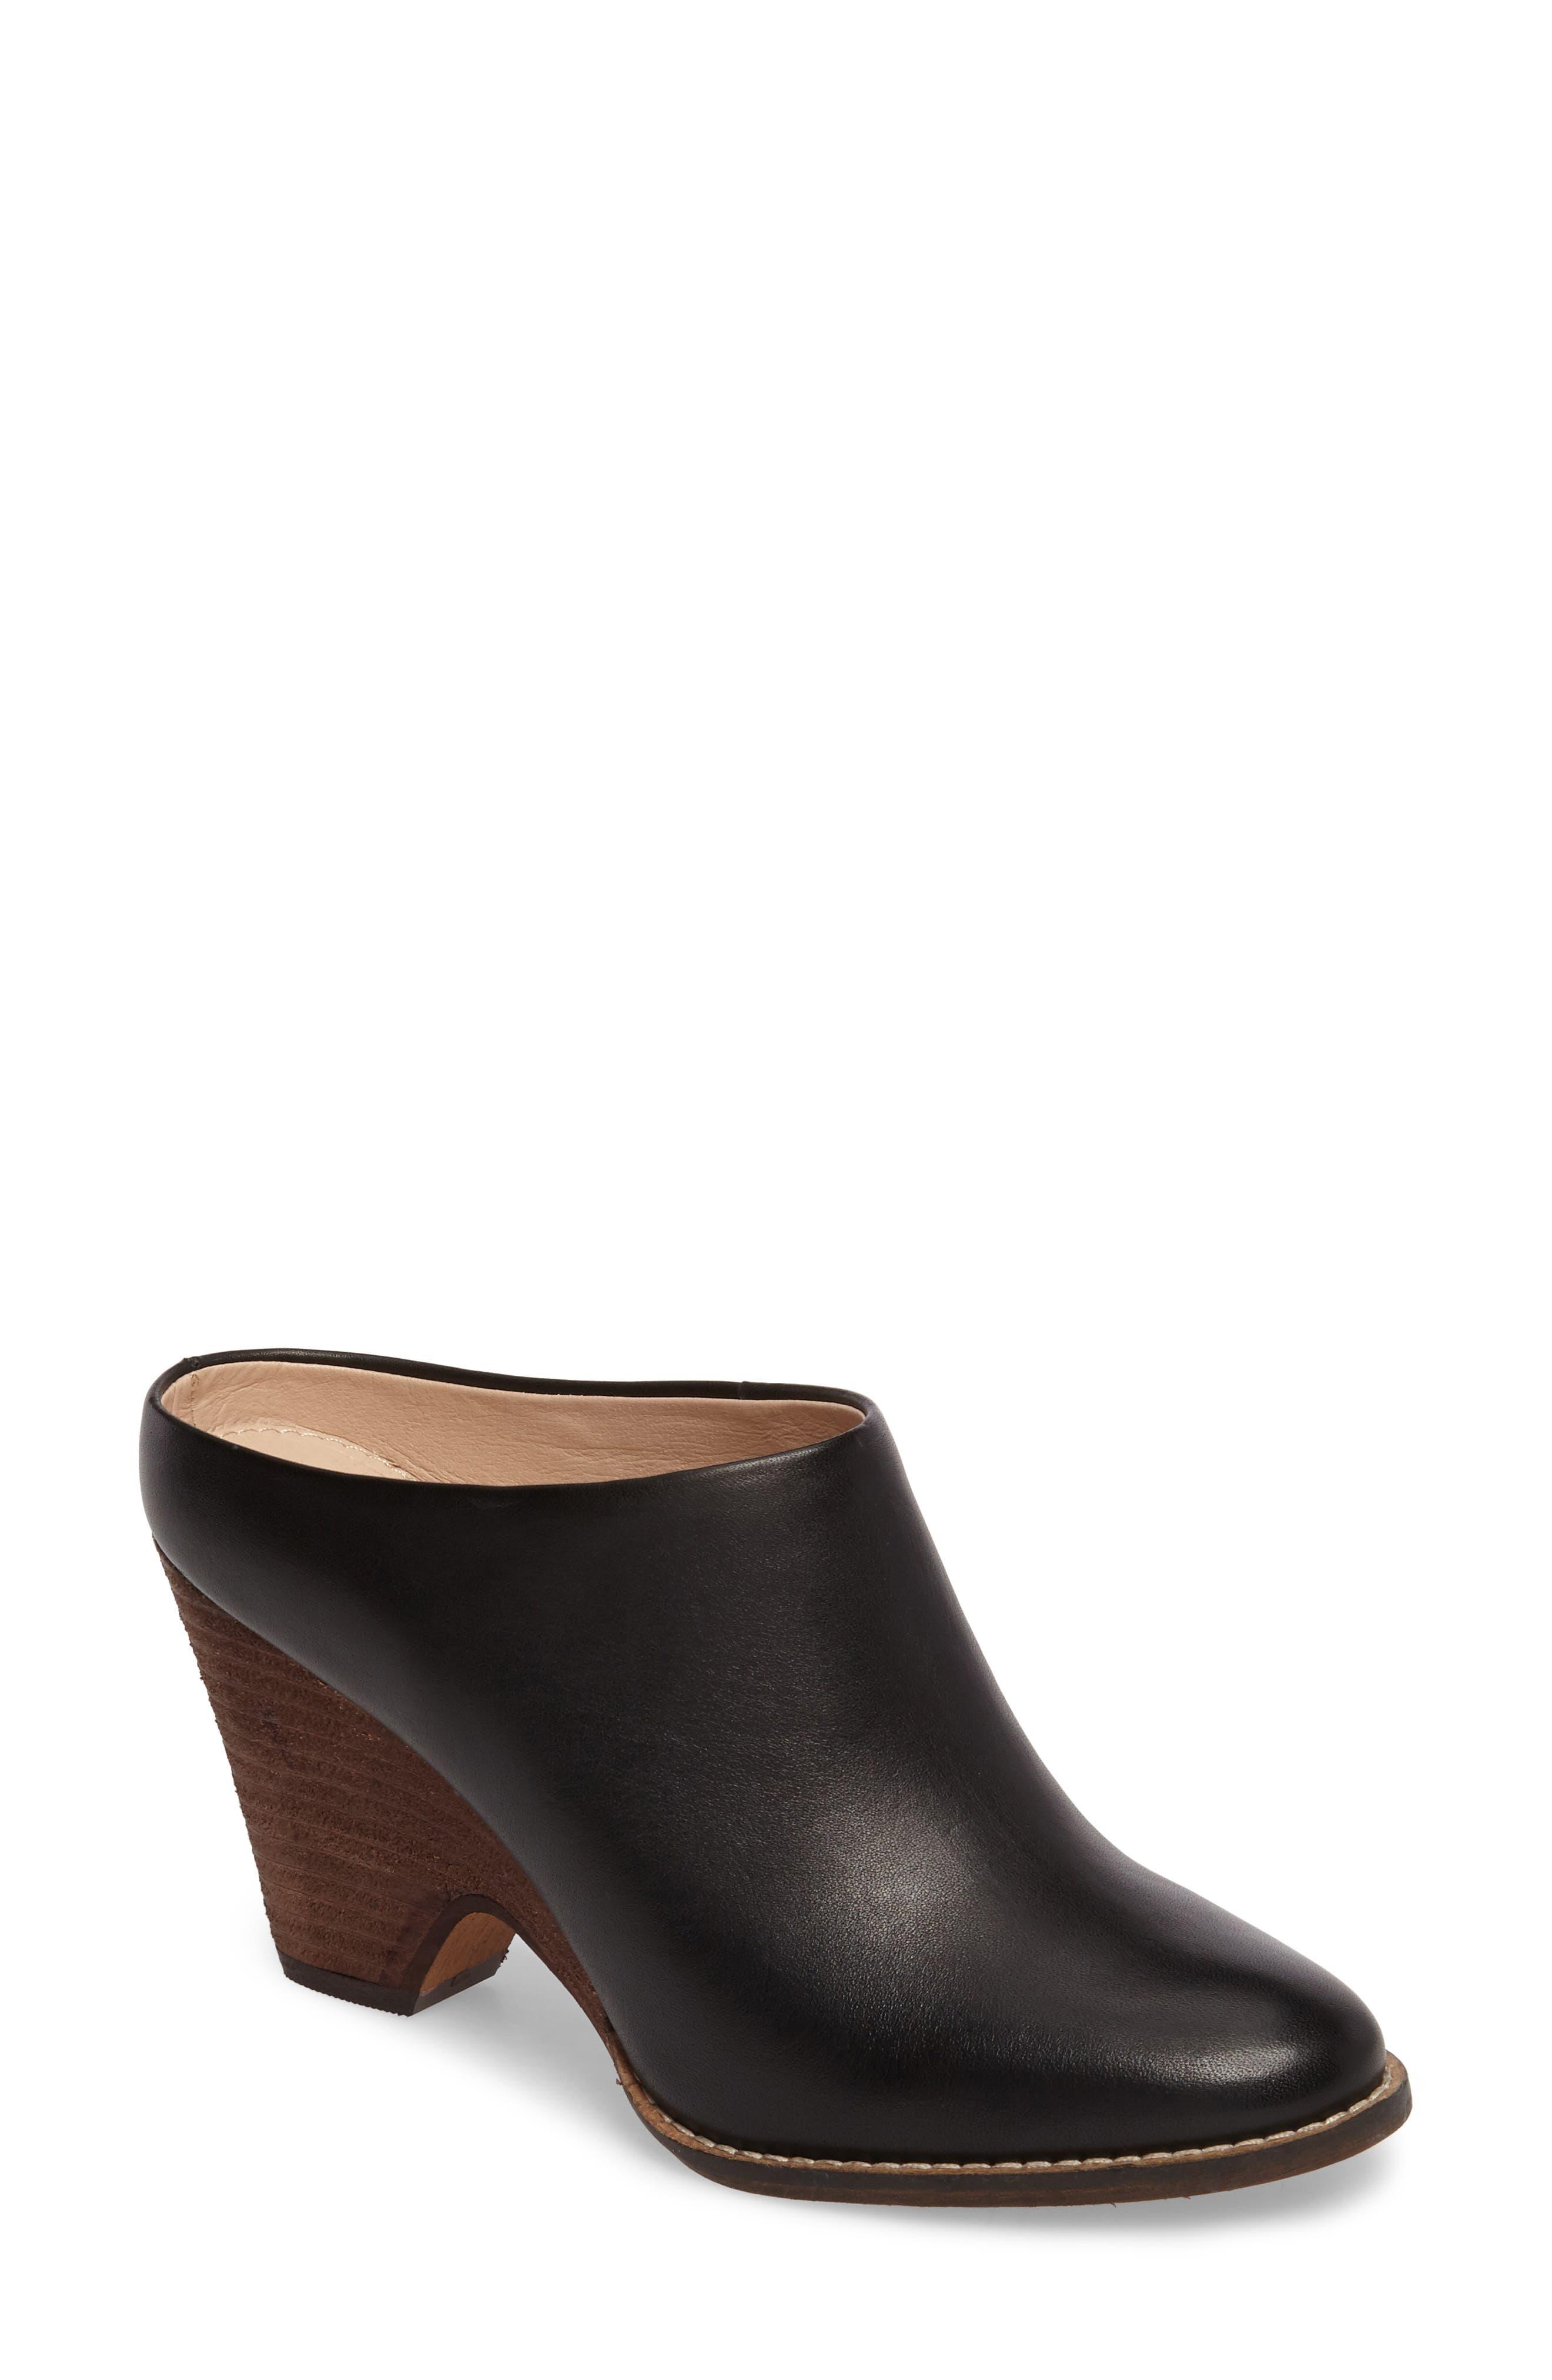 Hocking Mule,                         Main,                         color, Black Leather